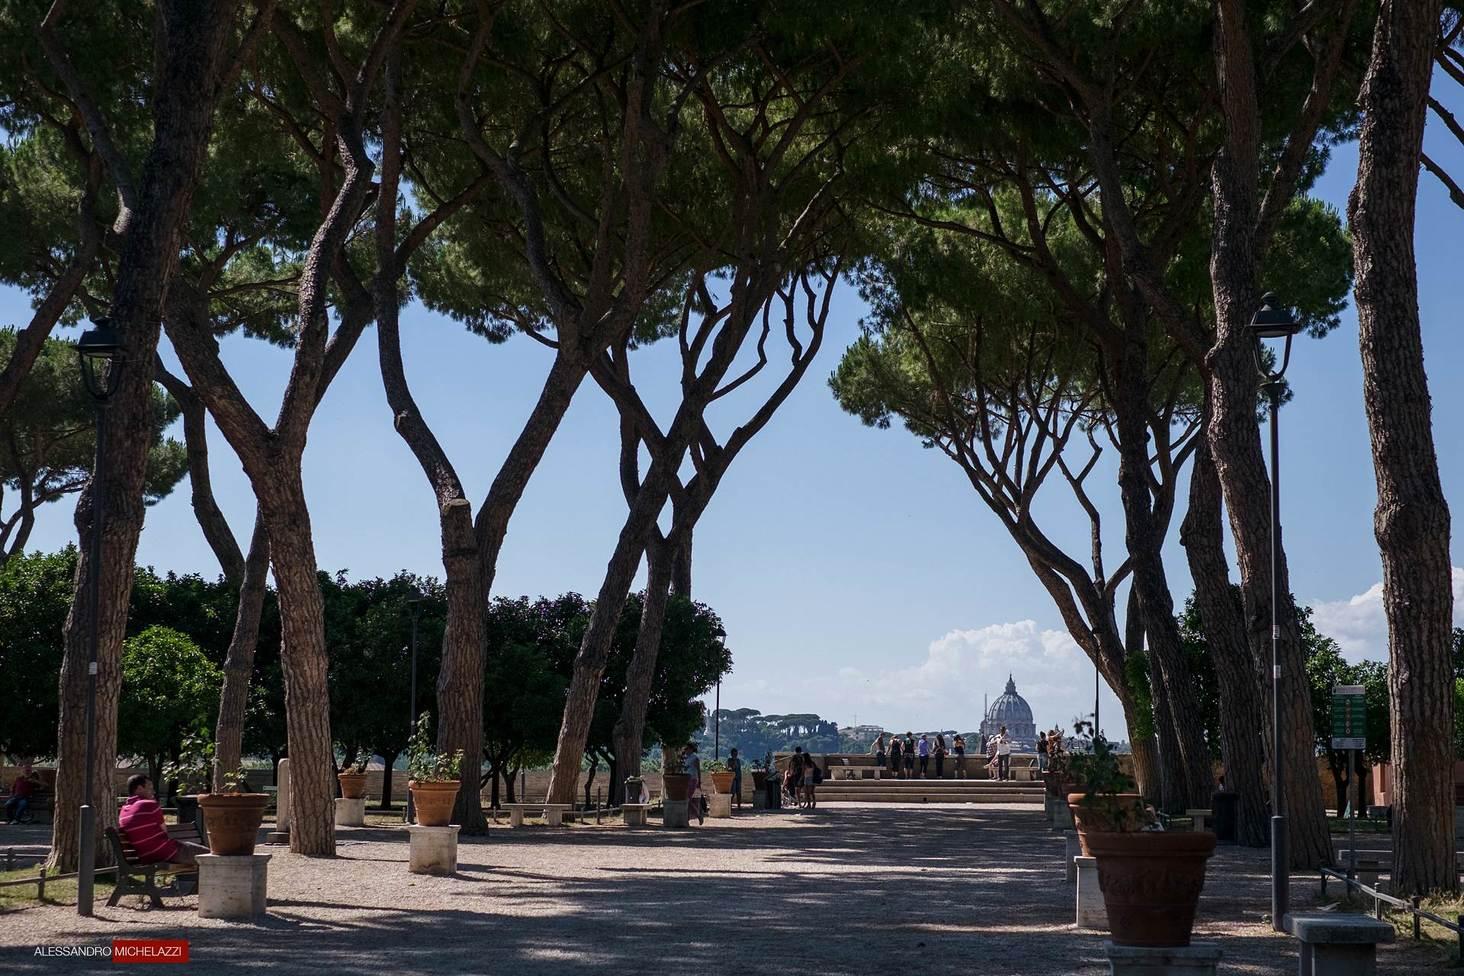 The beautiful view in the Piazzale degli aranci in Rome